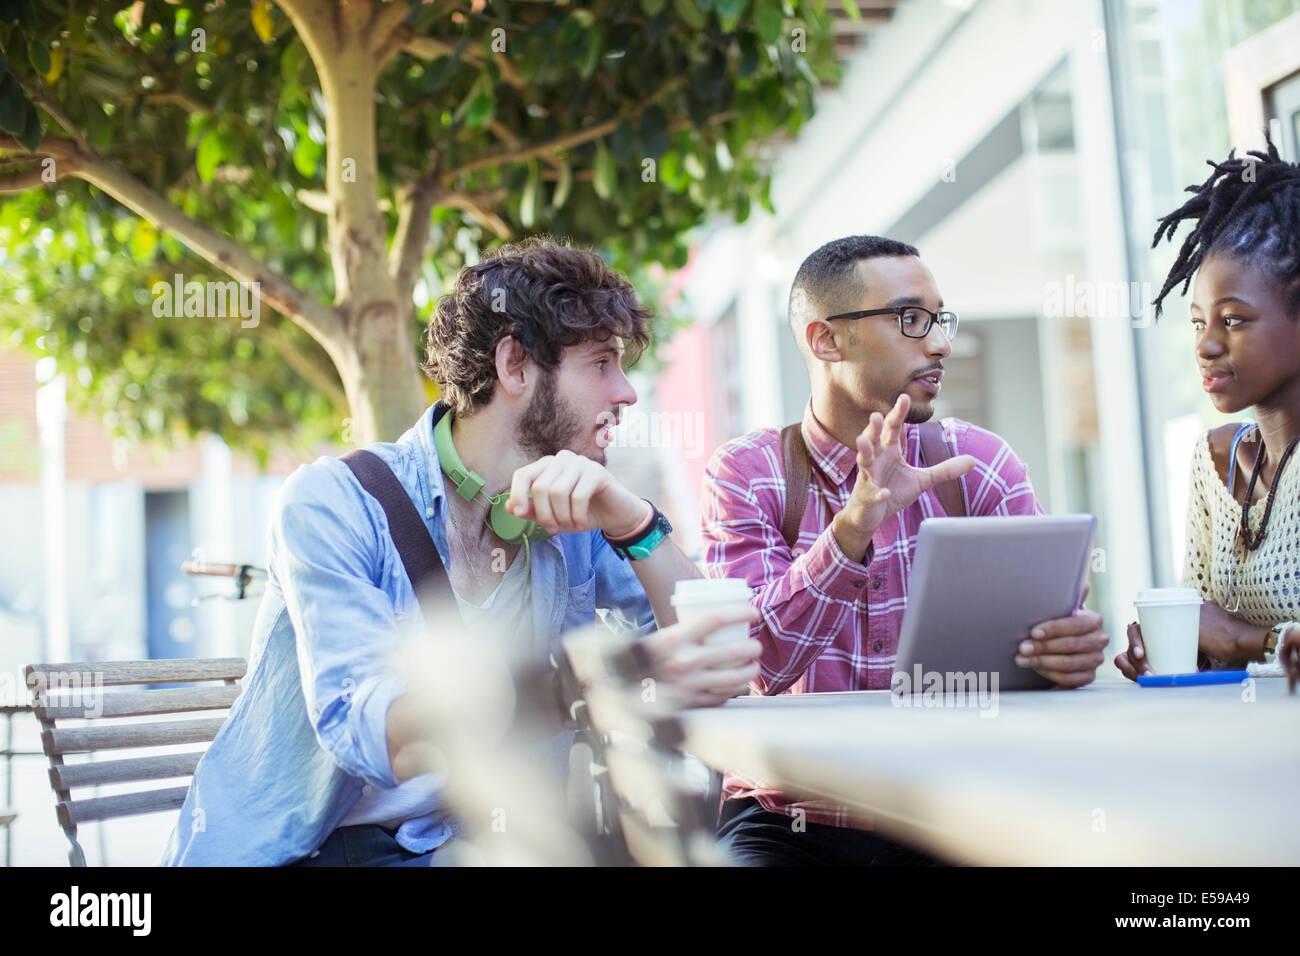 Friends talking at sidewalk cafe - Stock Image